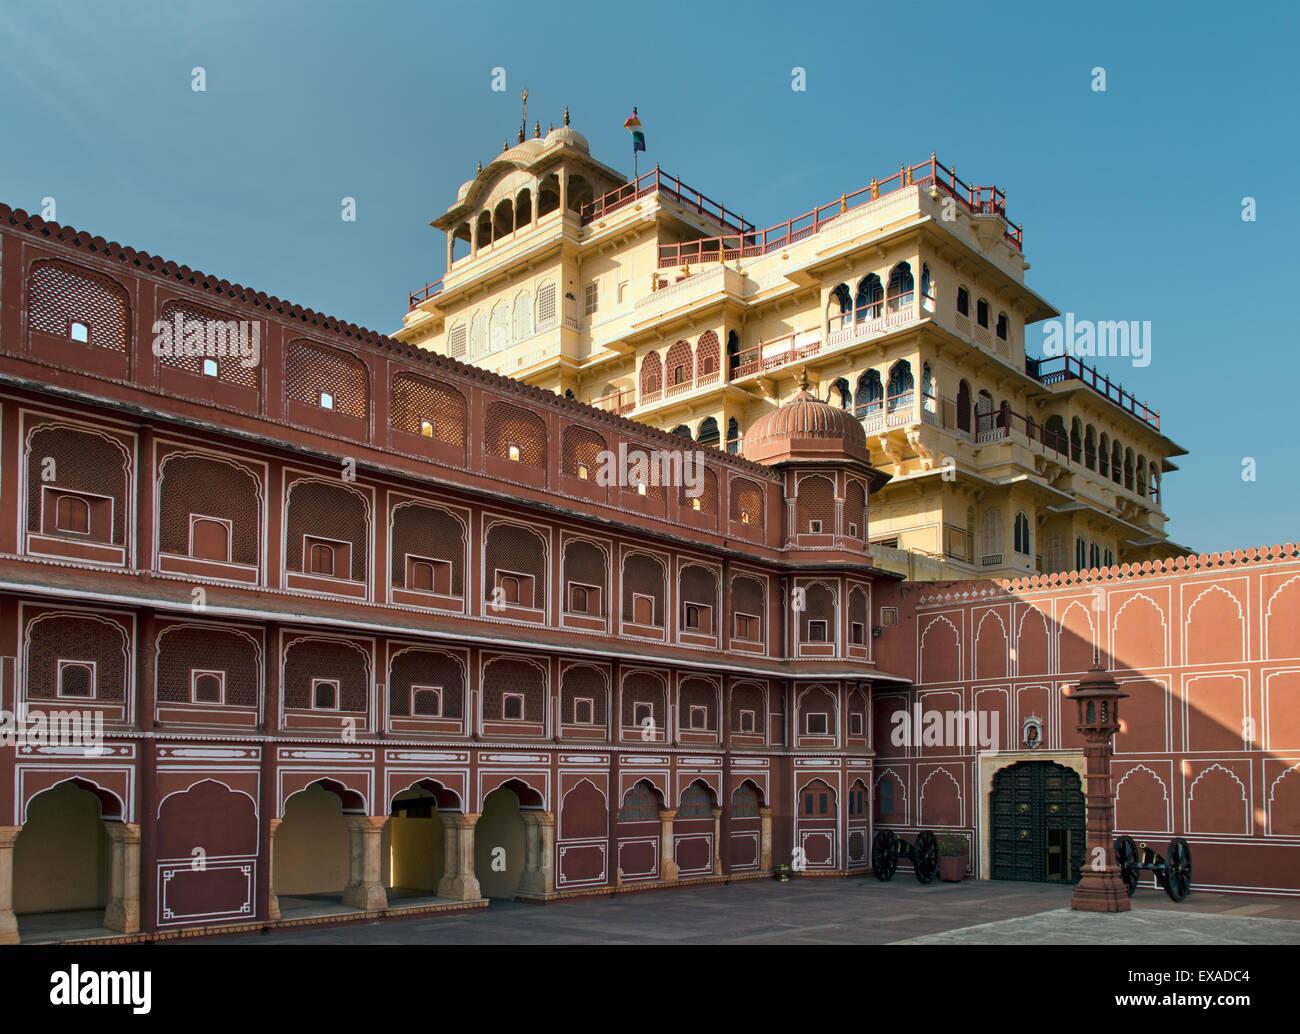 Chandra Mahal, City Palace of Jai Singh II., Pink City, Jaipur, Rajasthan, India - Stock Image